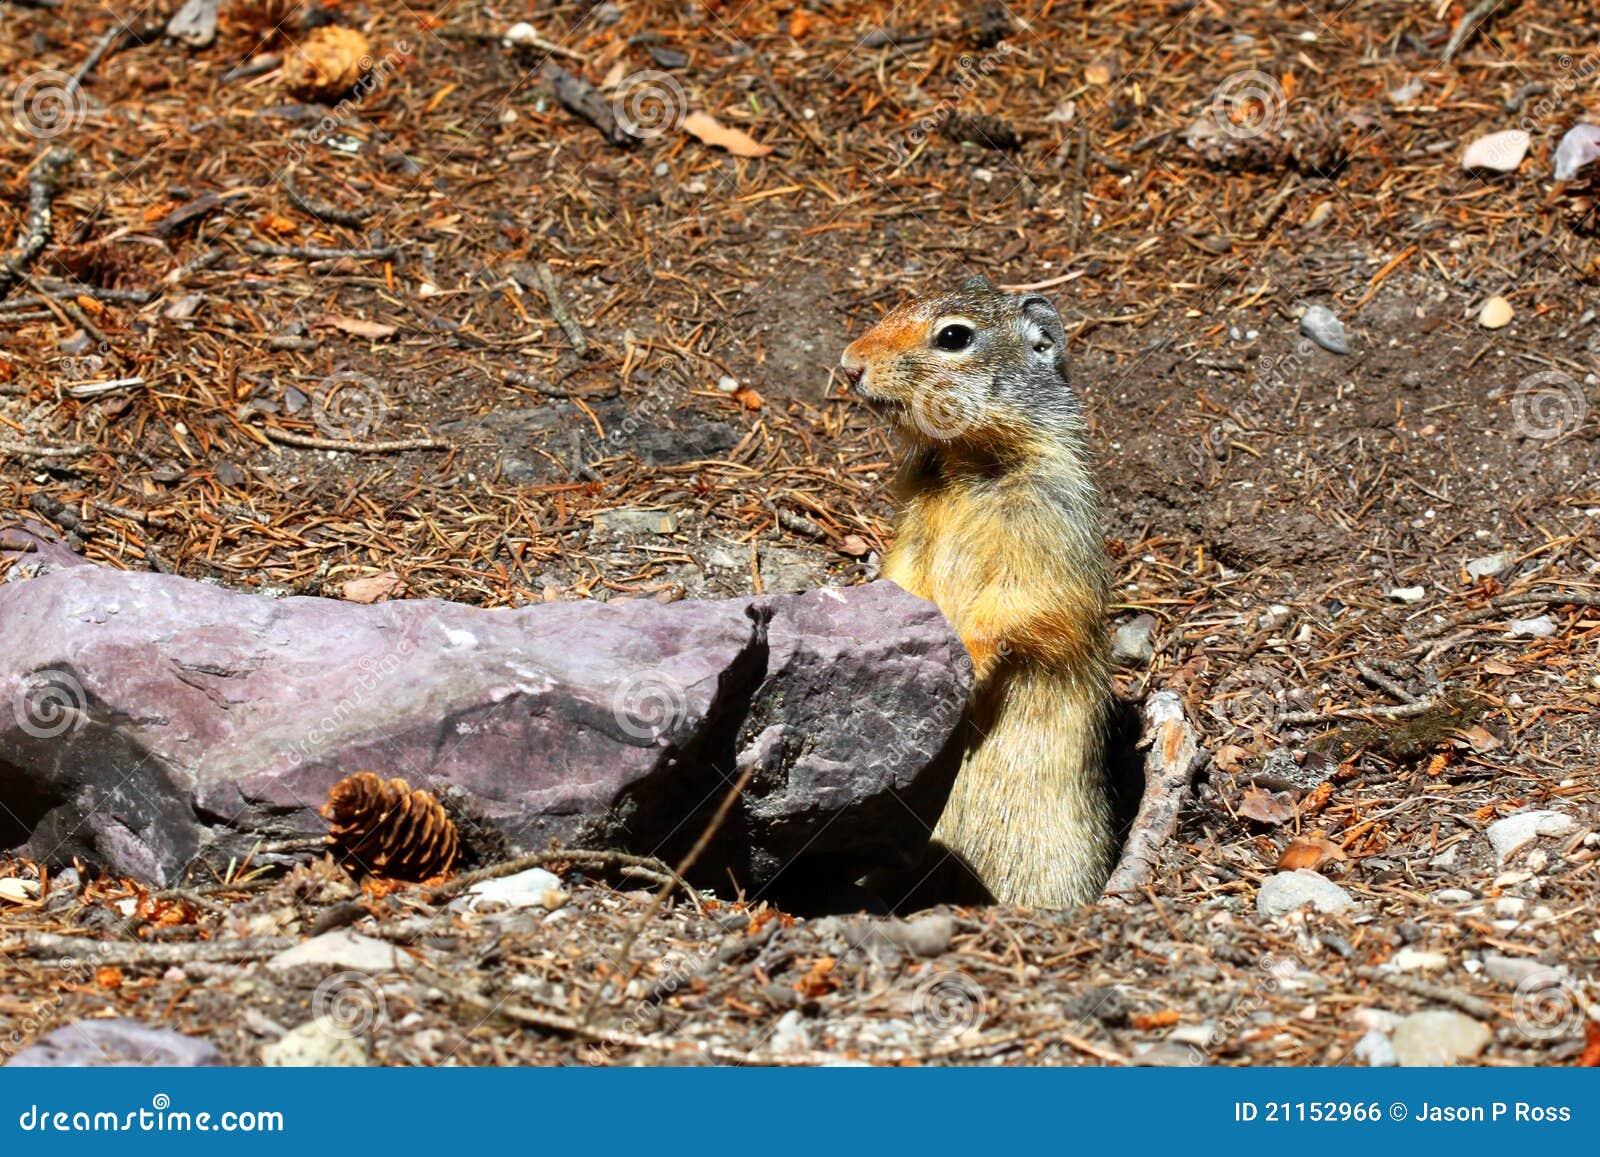 Columbian ground squirrel - Montana